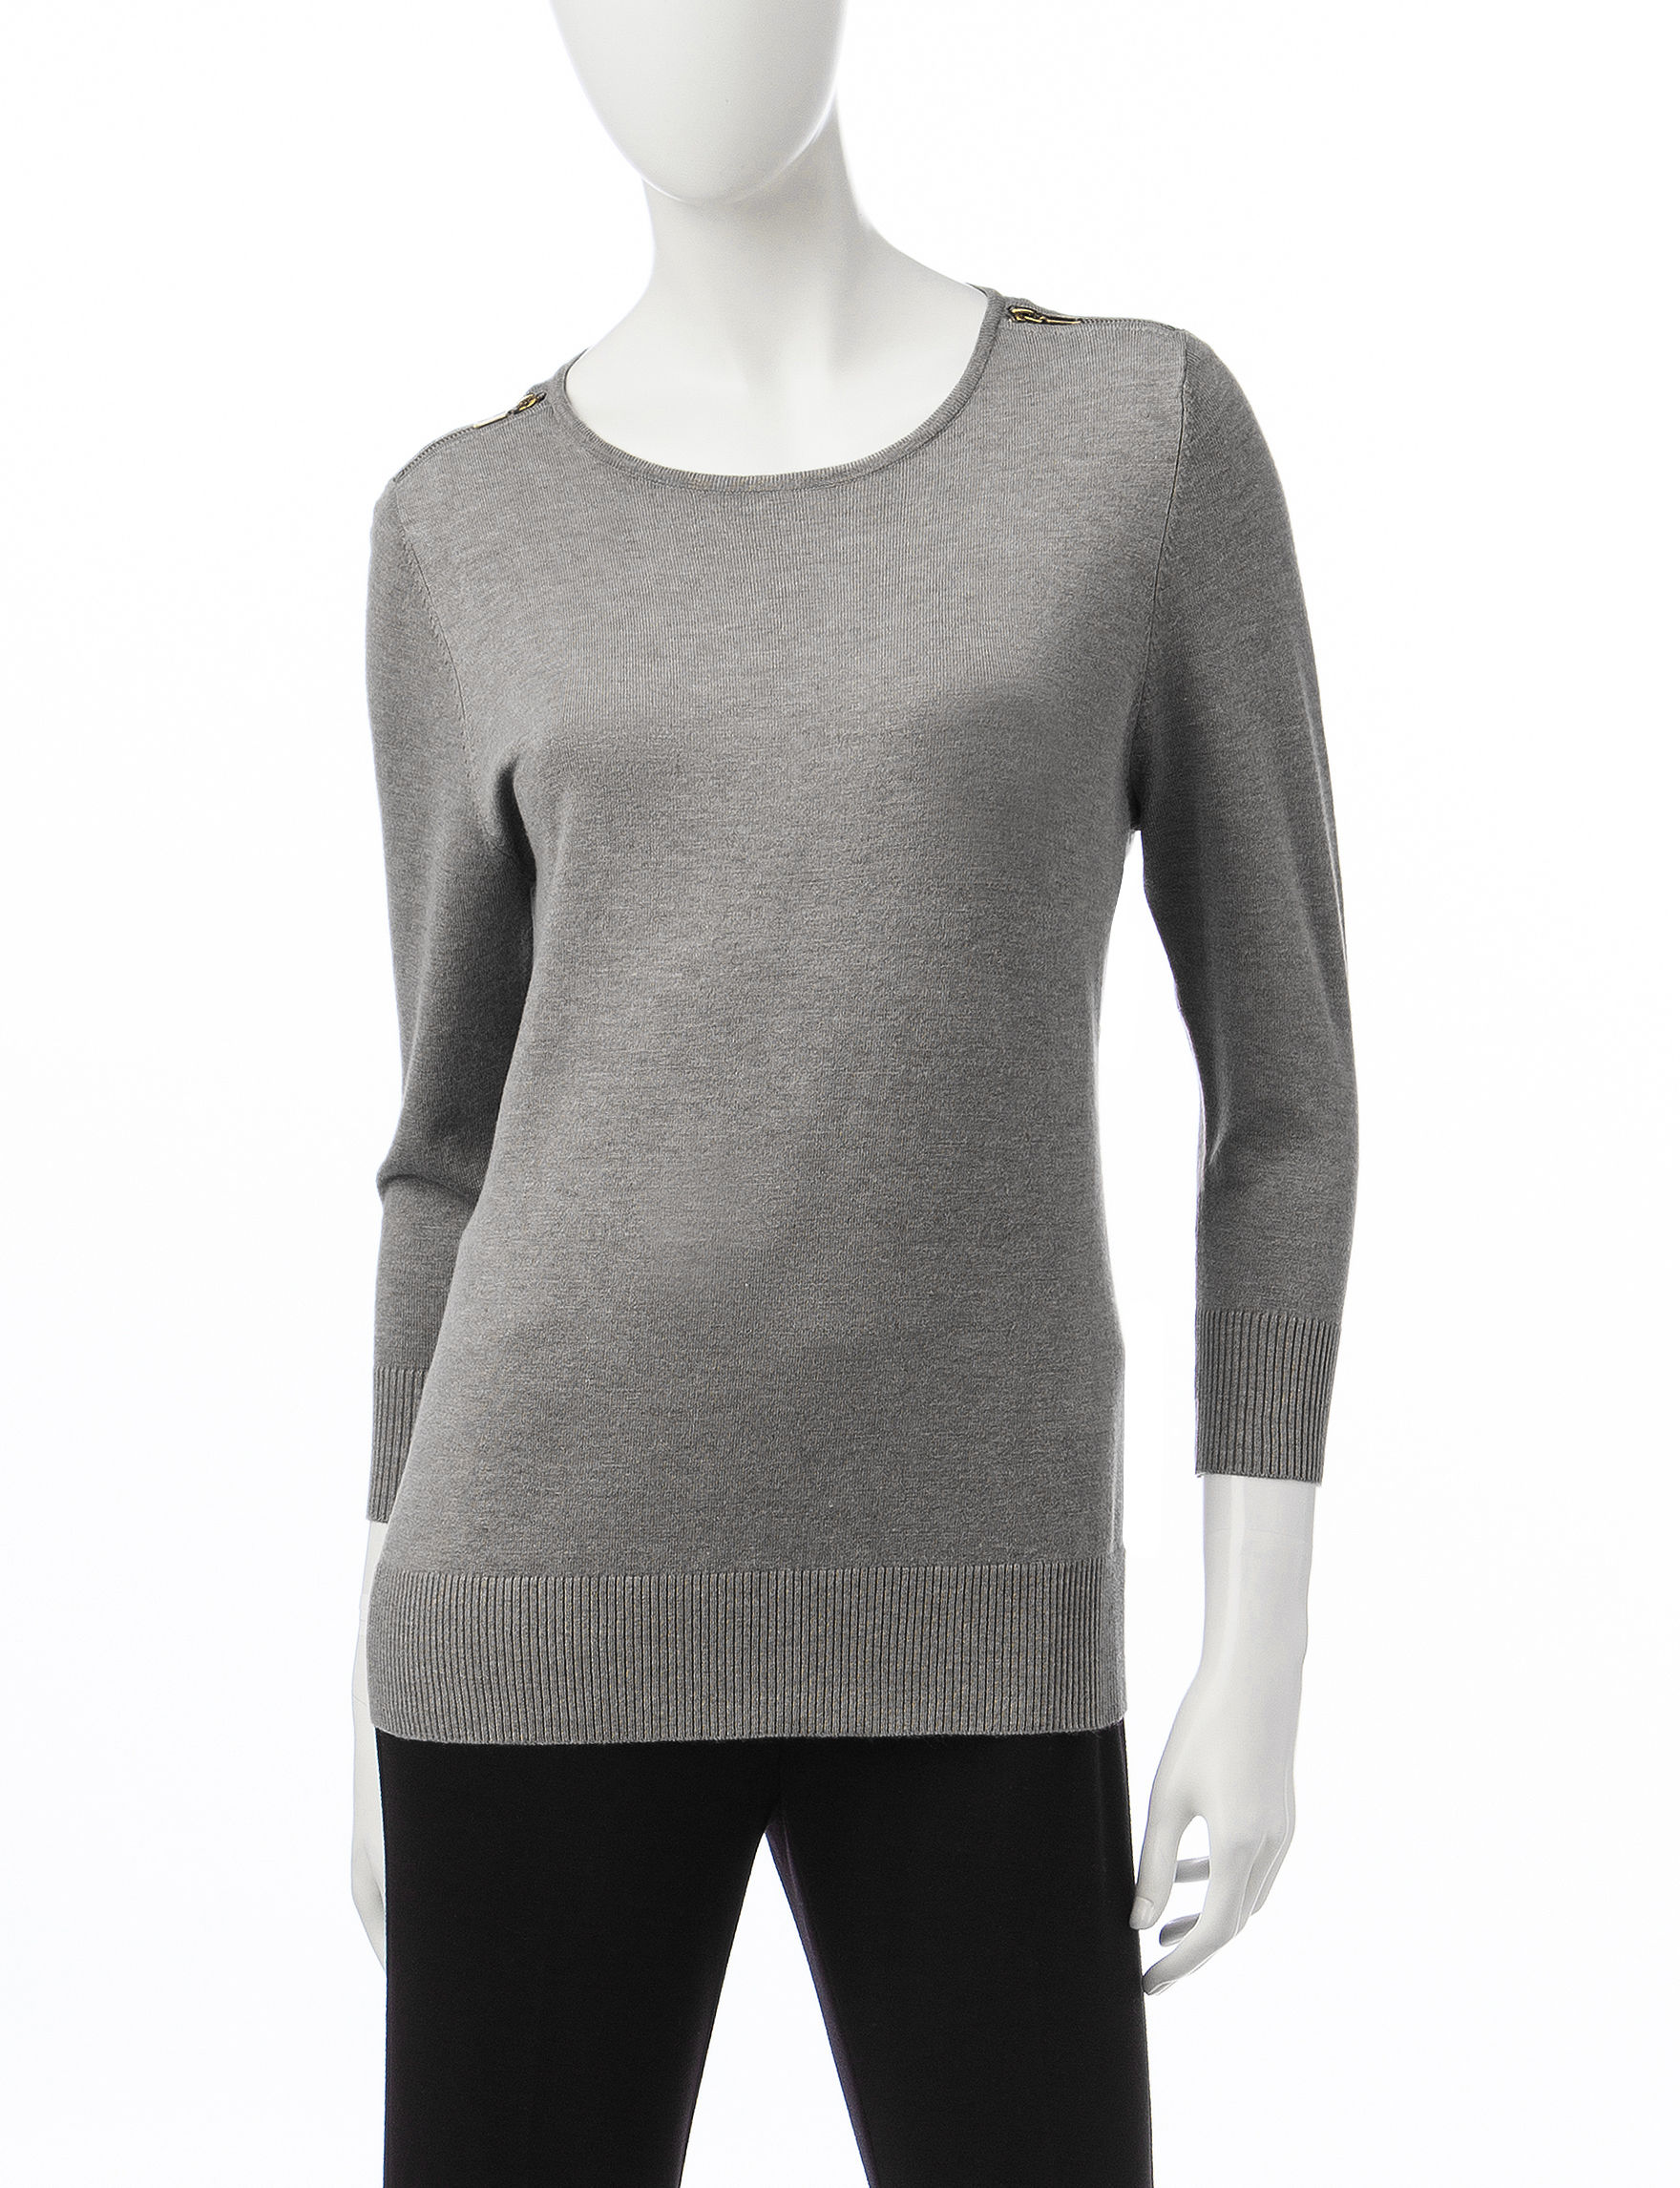 Valerie Stevens Medium Heather Grey Shirts & Blouses